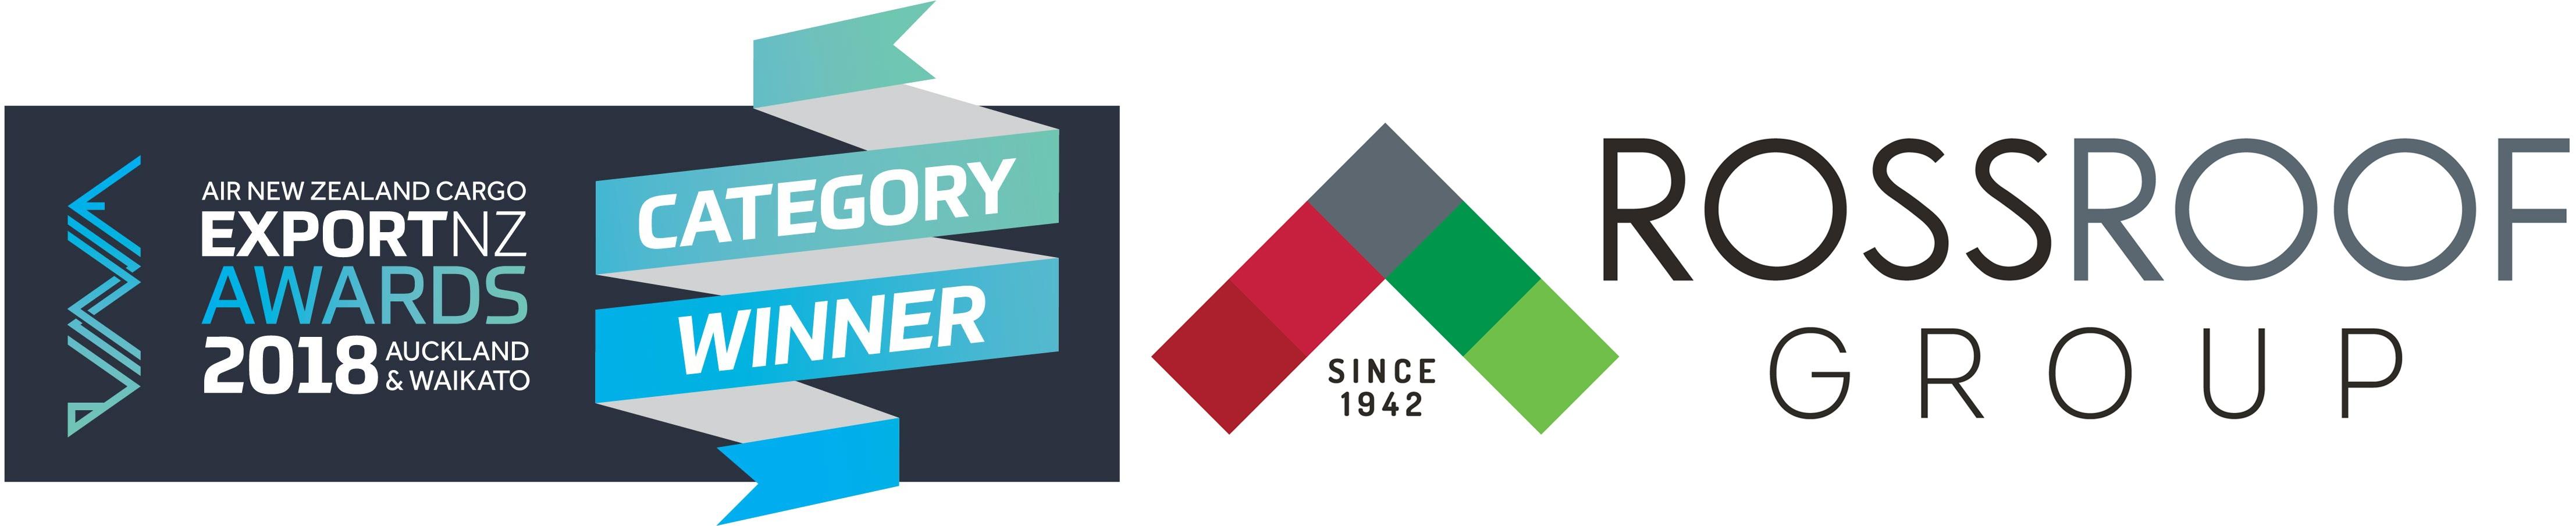 ExportNZ-Awards-2018-logos